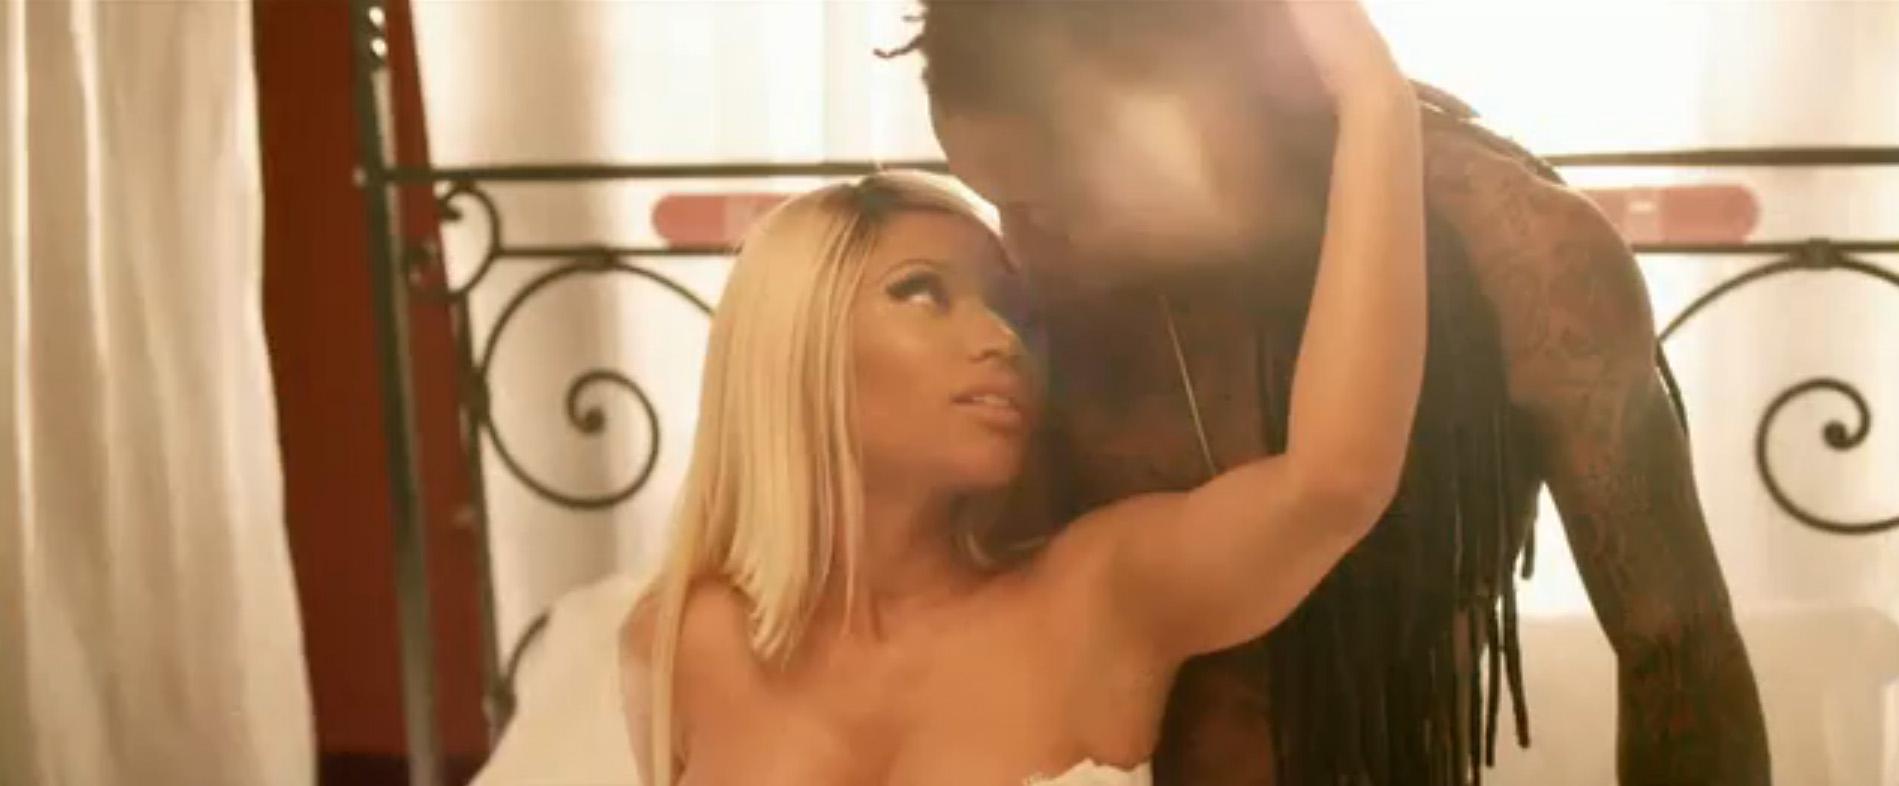 Barbarian sex image nude video